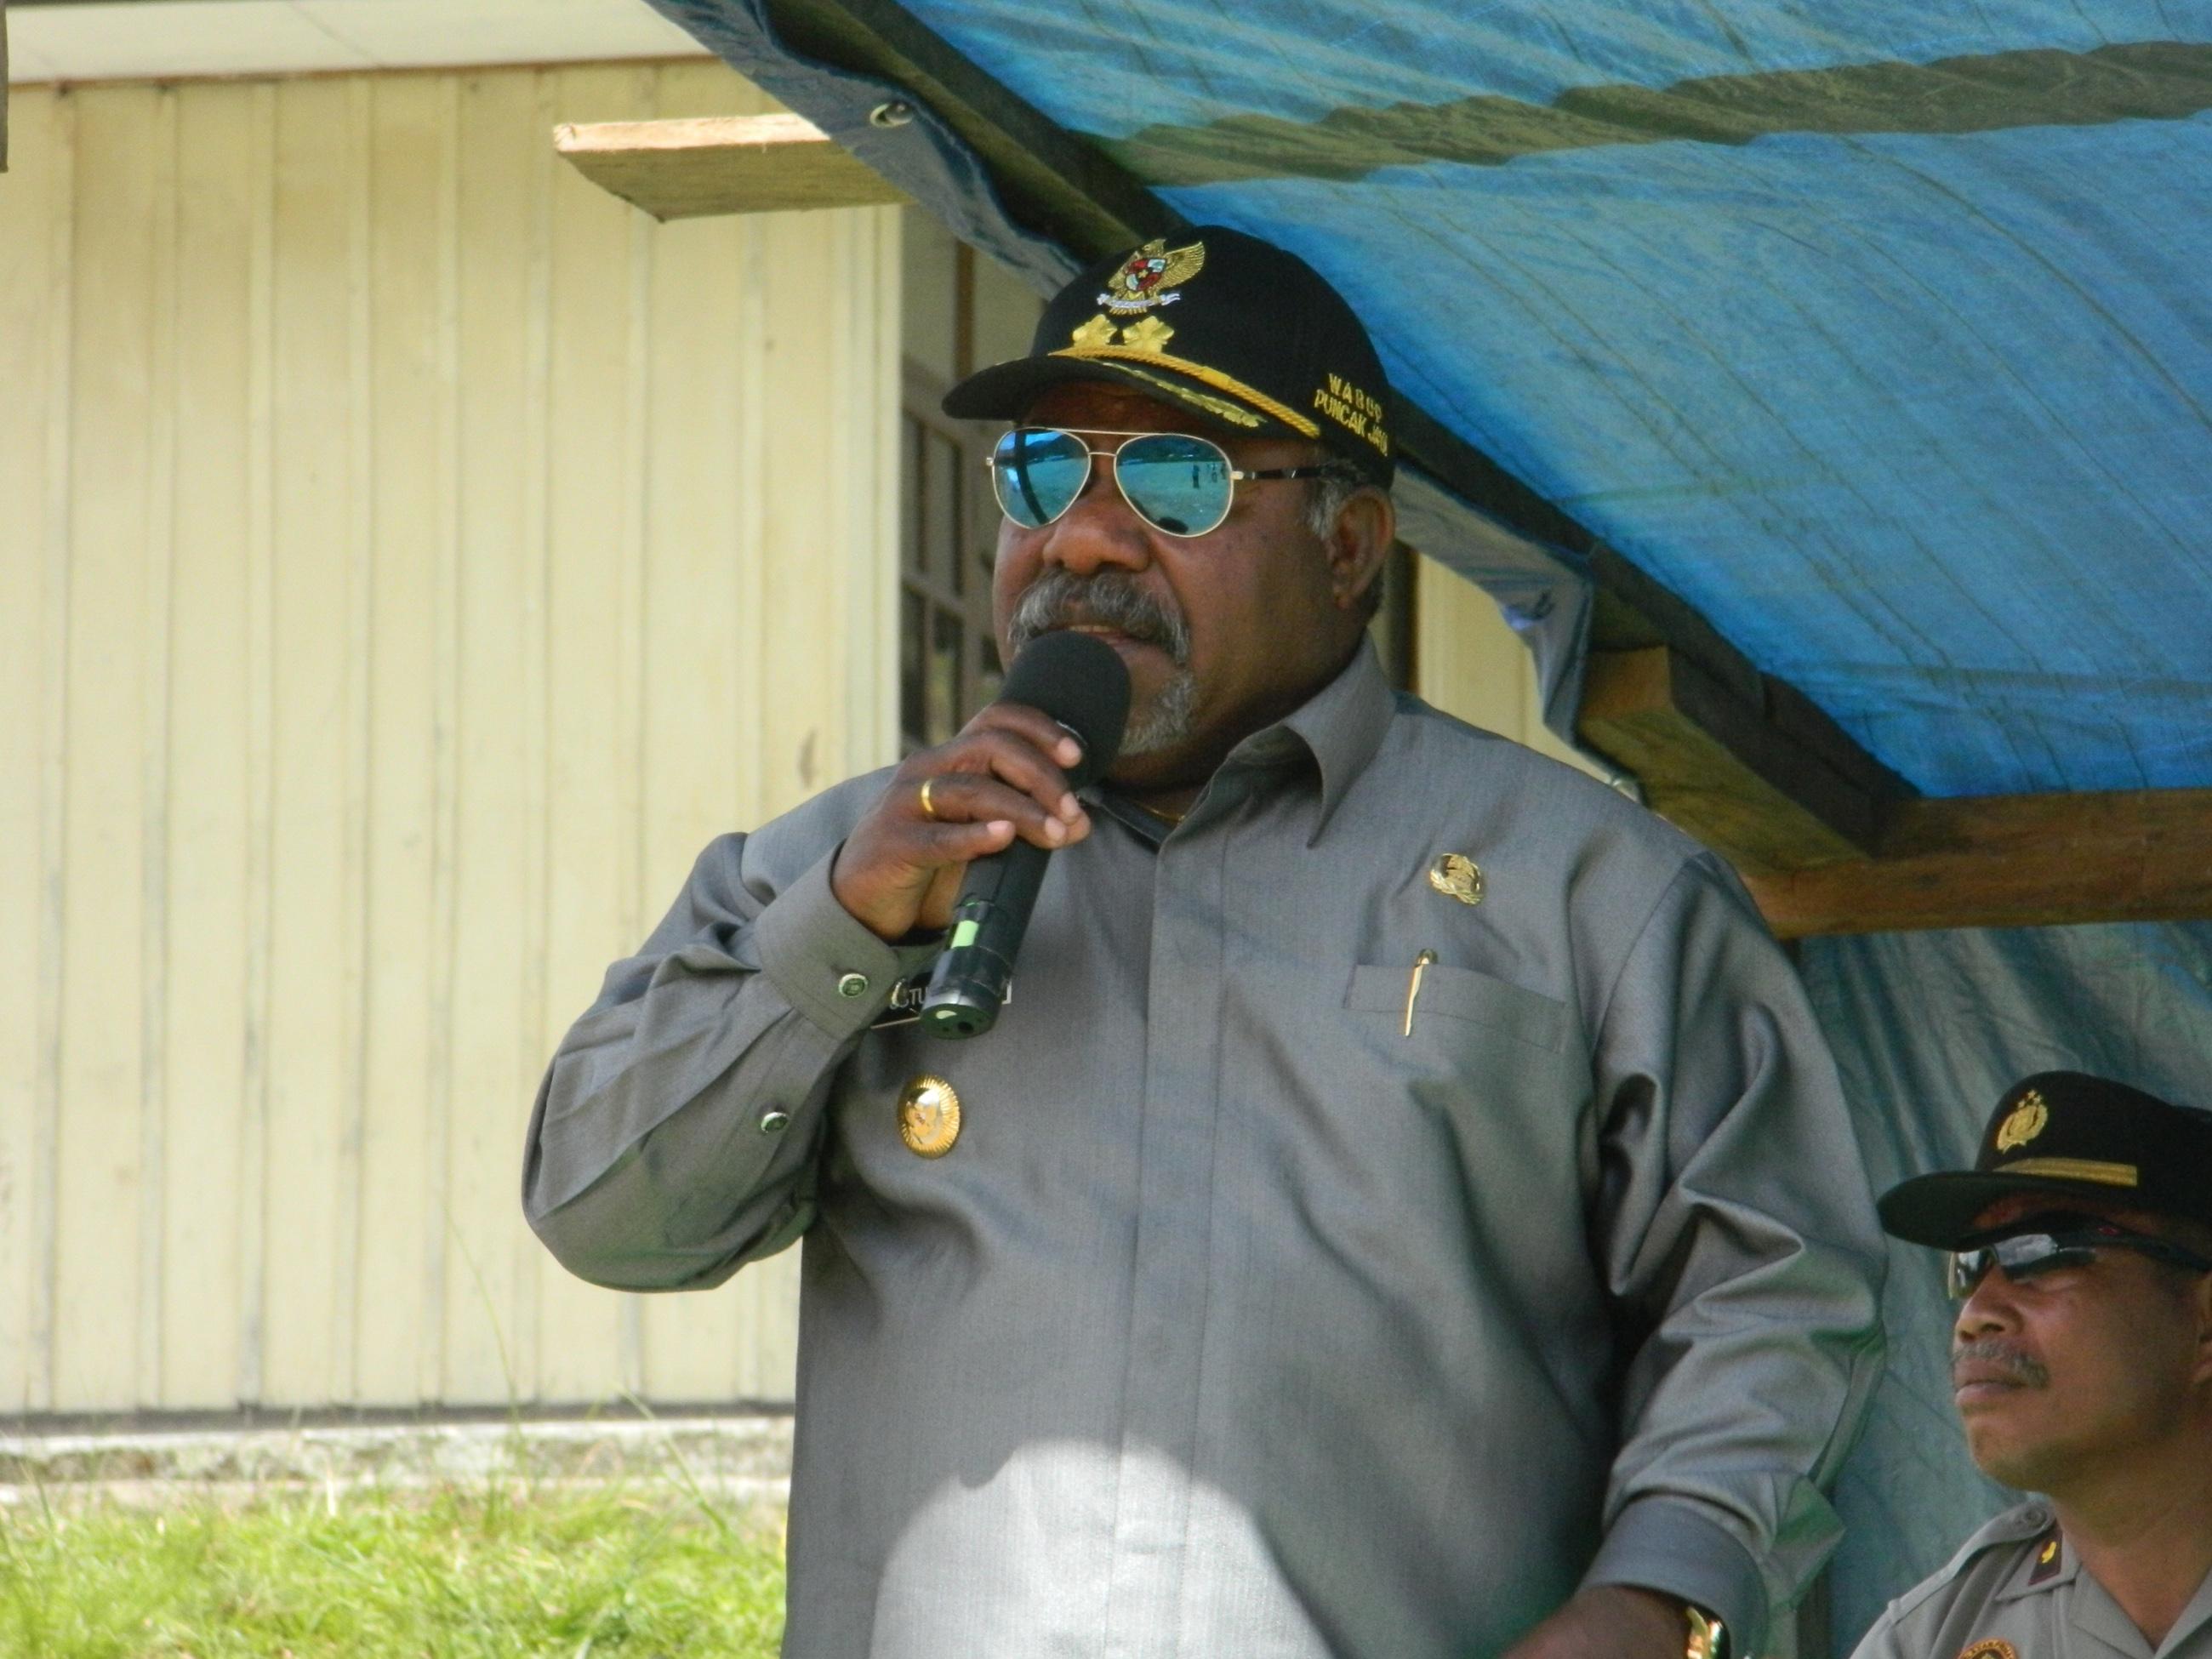 wakil Bupati saat memberikan sambutan di hadapan masyarakat kab. yamo